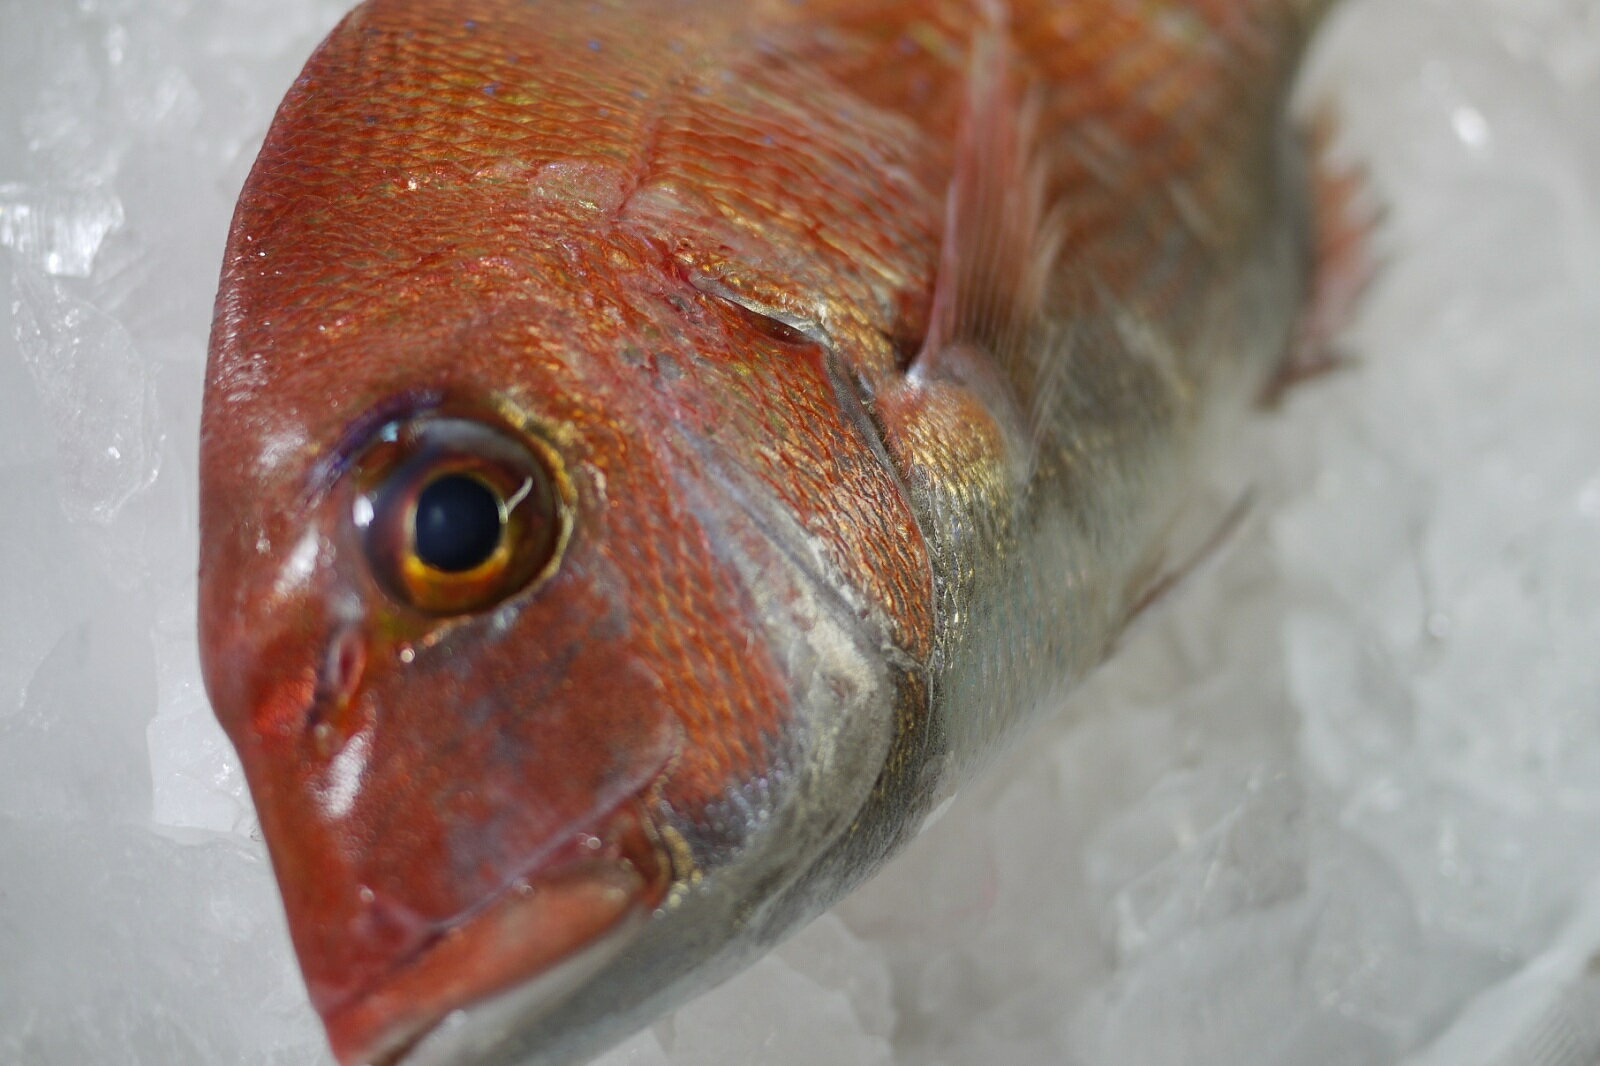 【送料無料】豊浜漁港直送 天然 活〆 真鯛(マダイ) 3kg以上